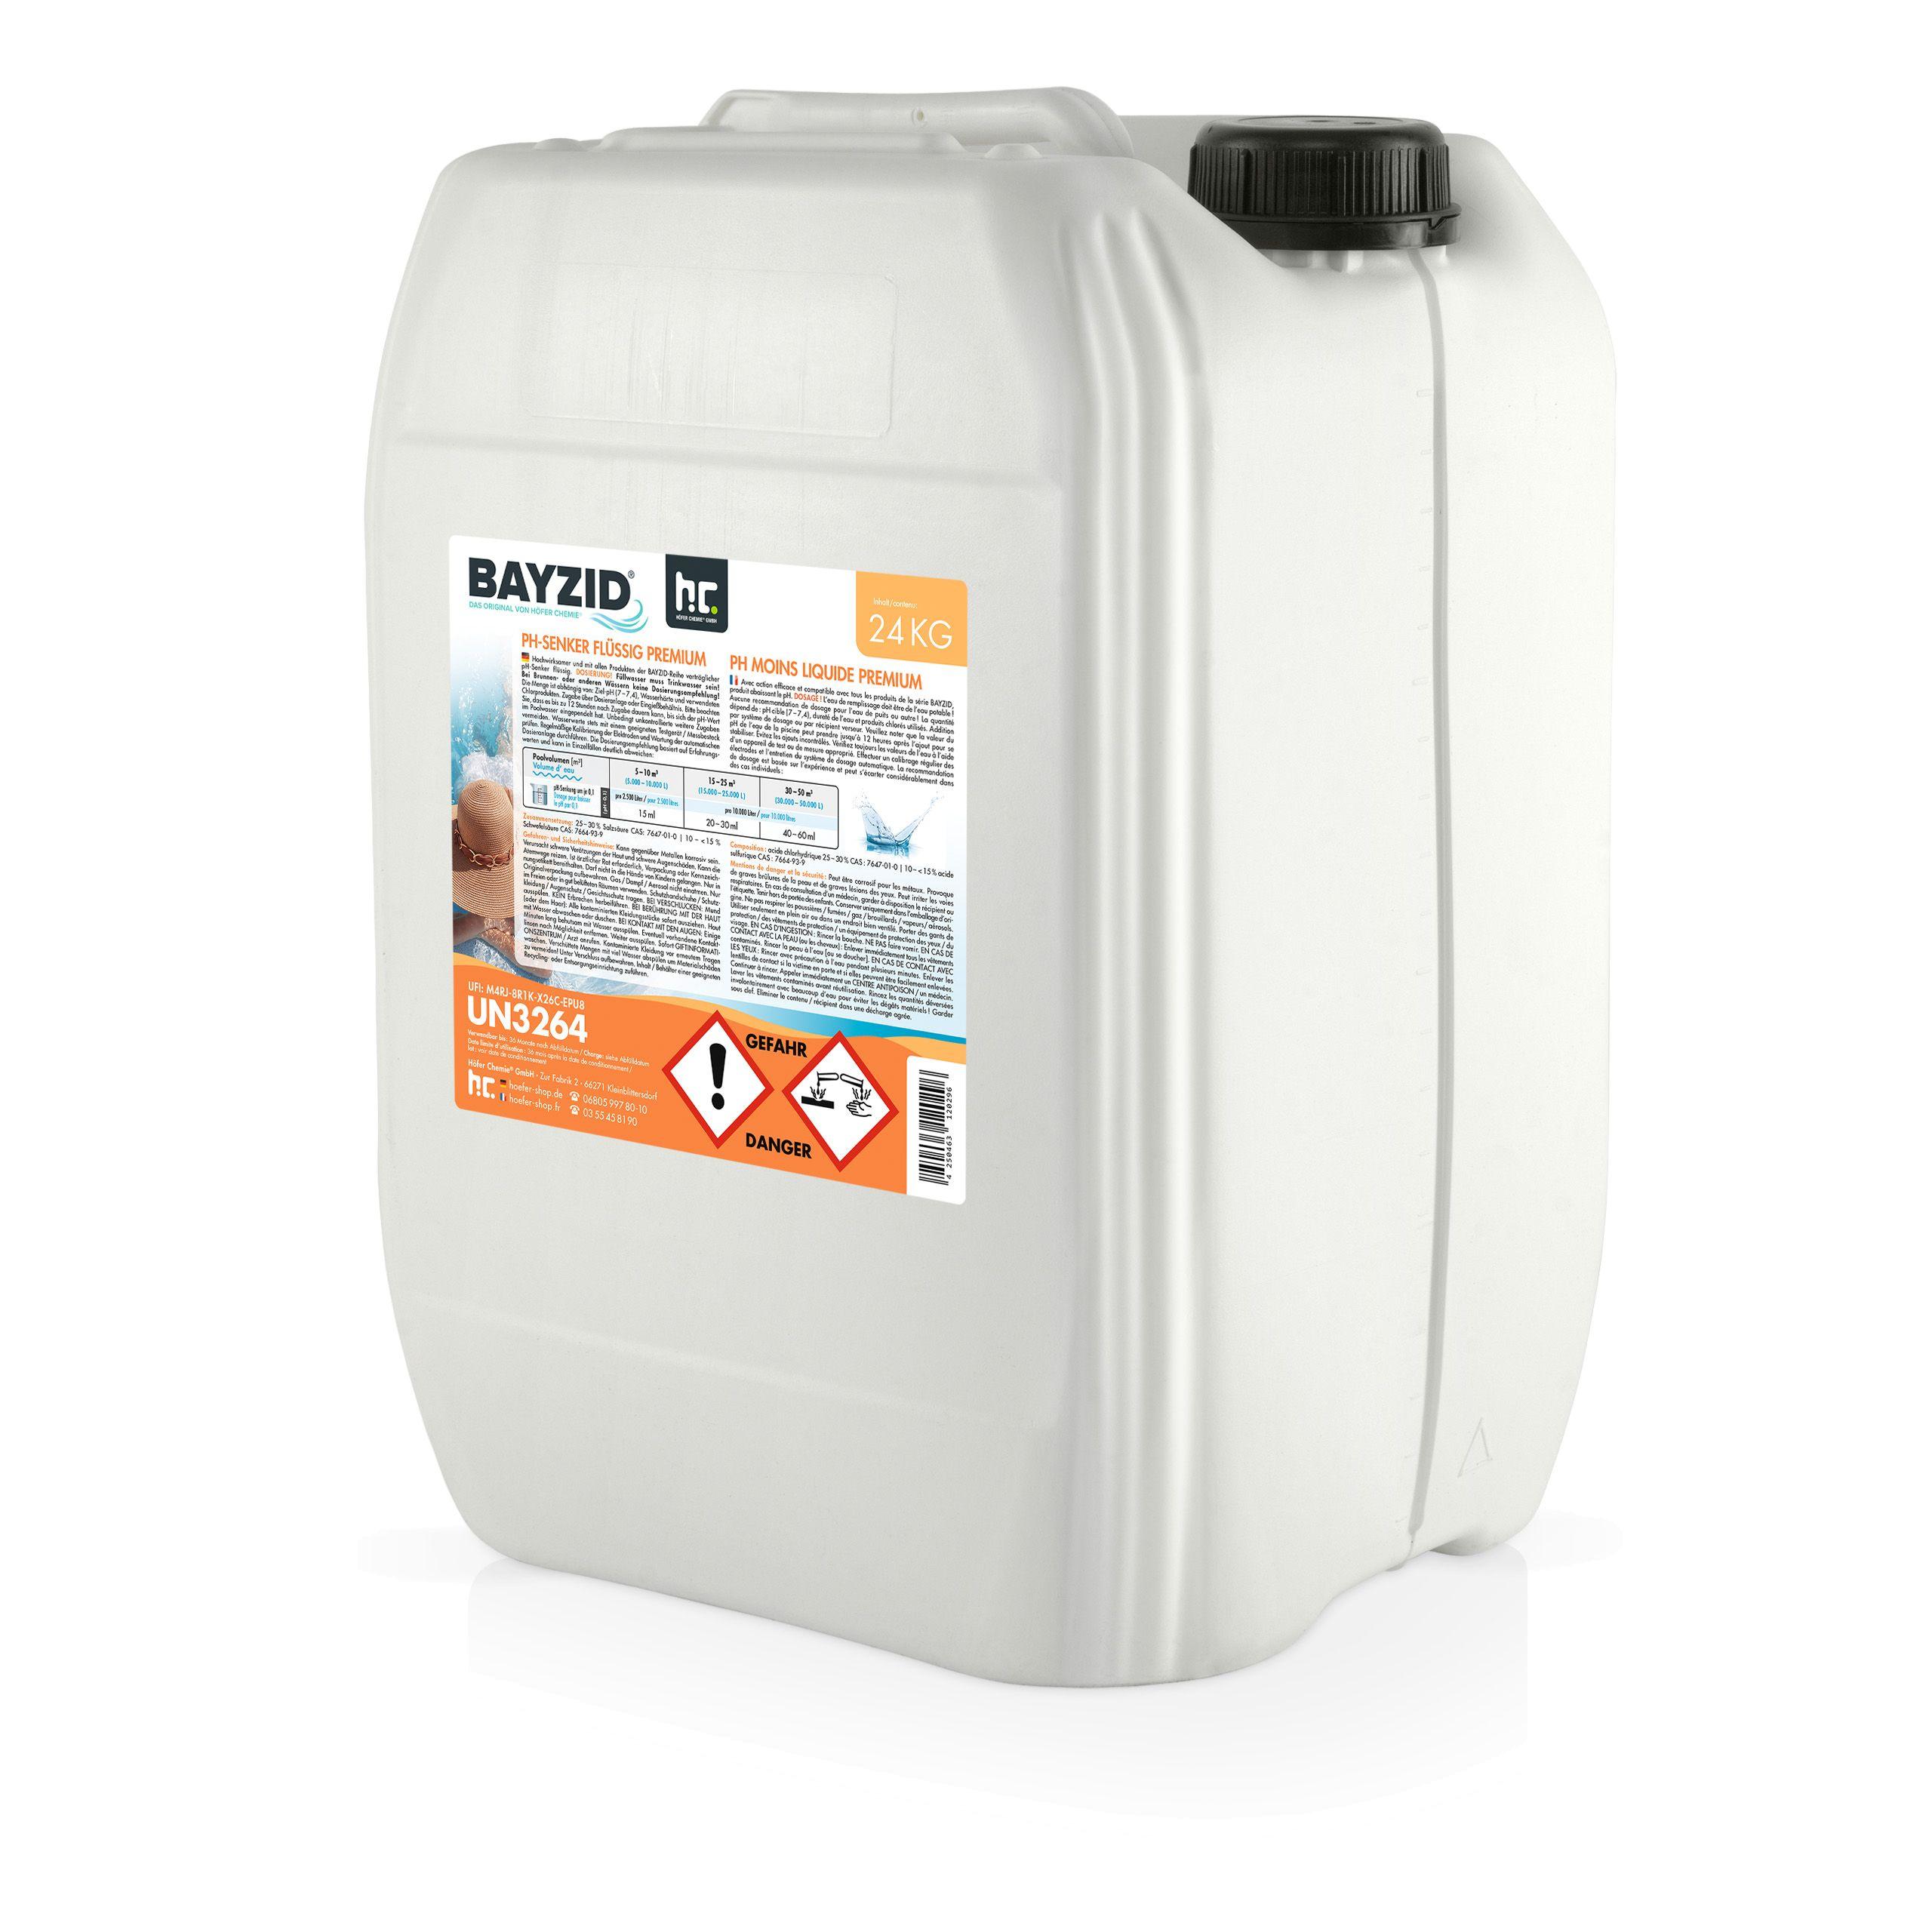 BAYZID pH-Senker Premium flüssig 24 kg Kanister